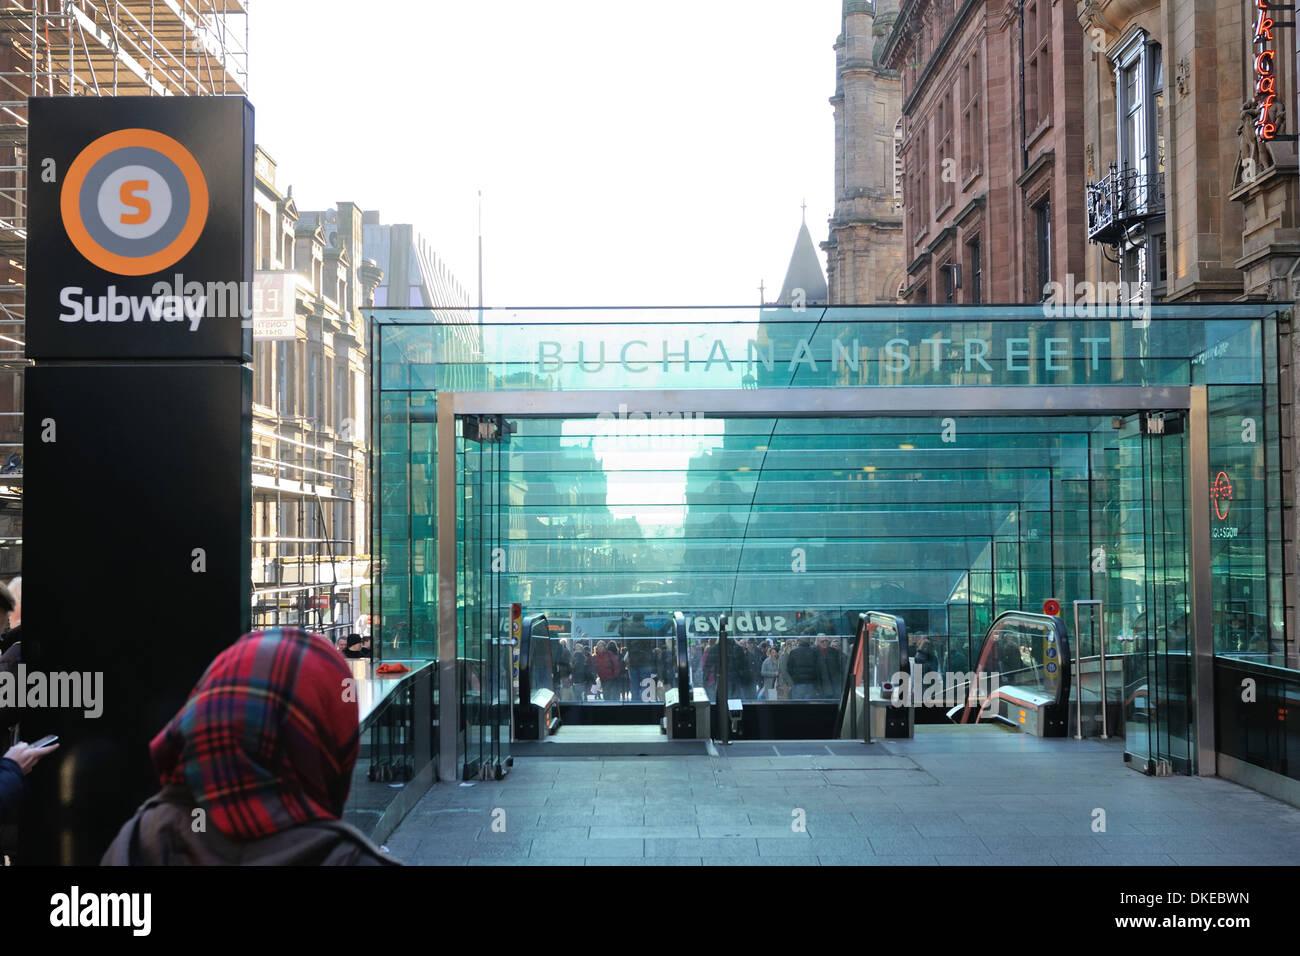 Buchanan Street subway station in Glasgow, Scotland, UK. - Stock Image